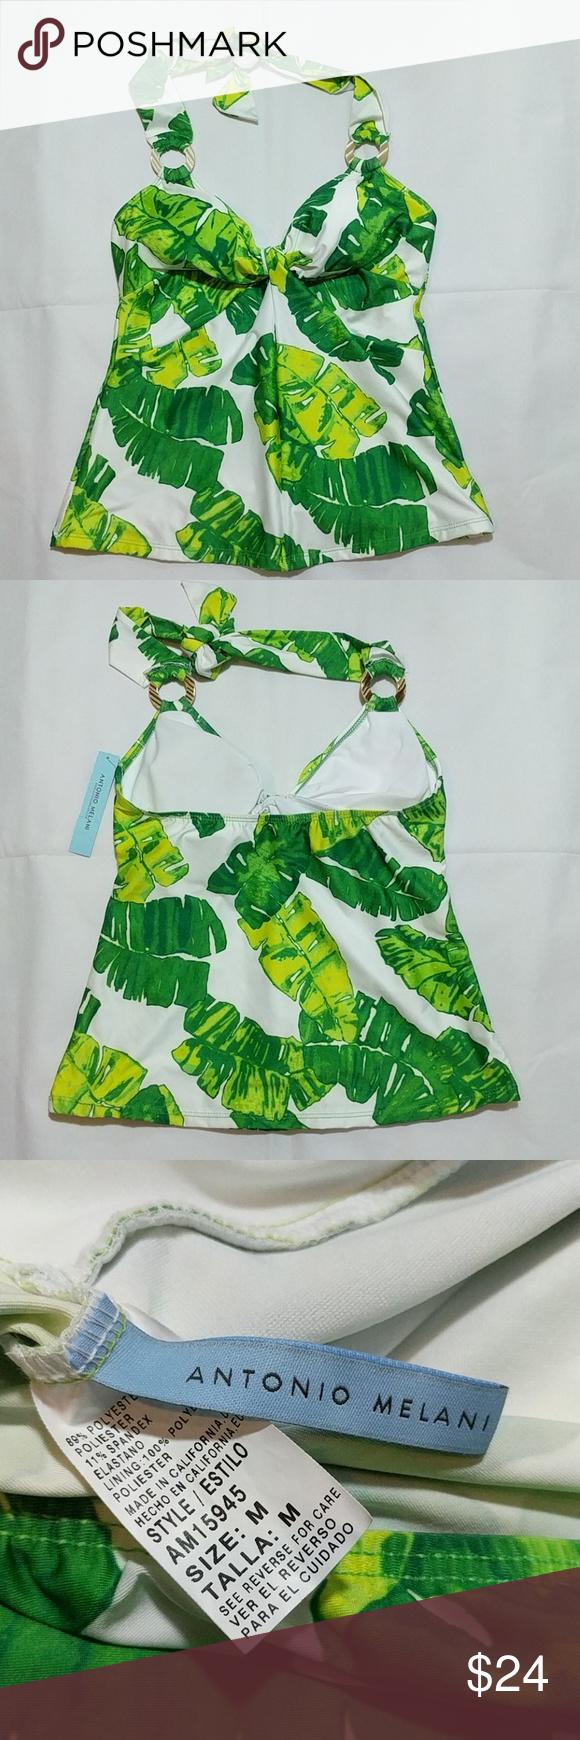 bb28525612 Antonio Melani Tankini size medium NWT Palm leaf print🐬 Top Only🐬 ANTONIO  MELANI Swim